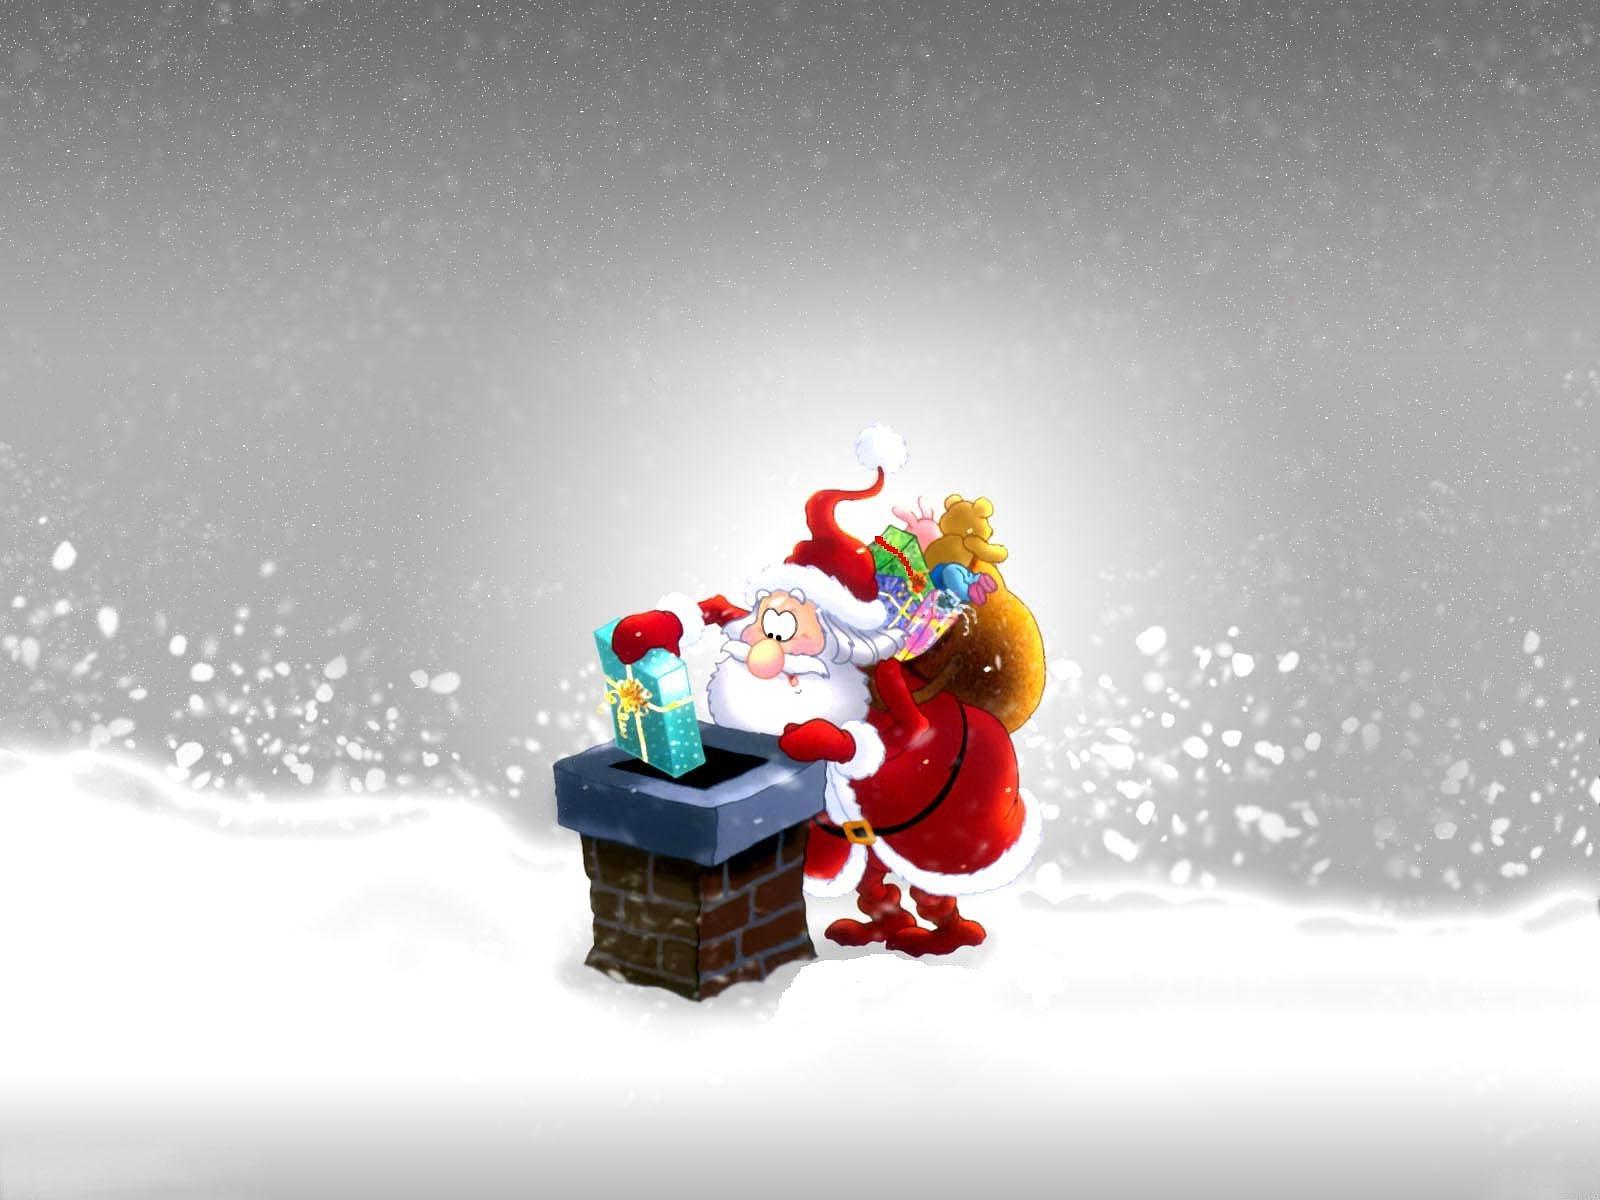 http://1.bp.blogspot.com/-23W4rqcOK_I/Tq_TIEc61HI/AAAAAAAAP3g/F1jK14lJvuI/s1600/Mooie-kerstman-achtergronden-leuke-kerstman-wallpapers-afbeelding-plaatje-foto-24.jpg